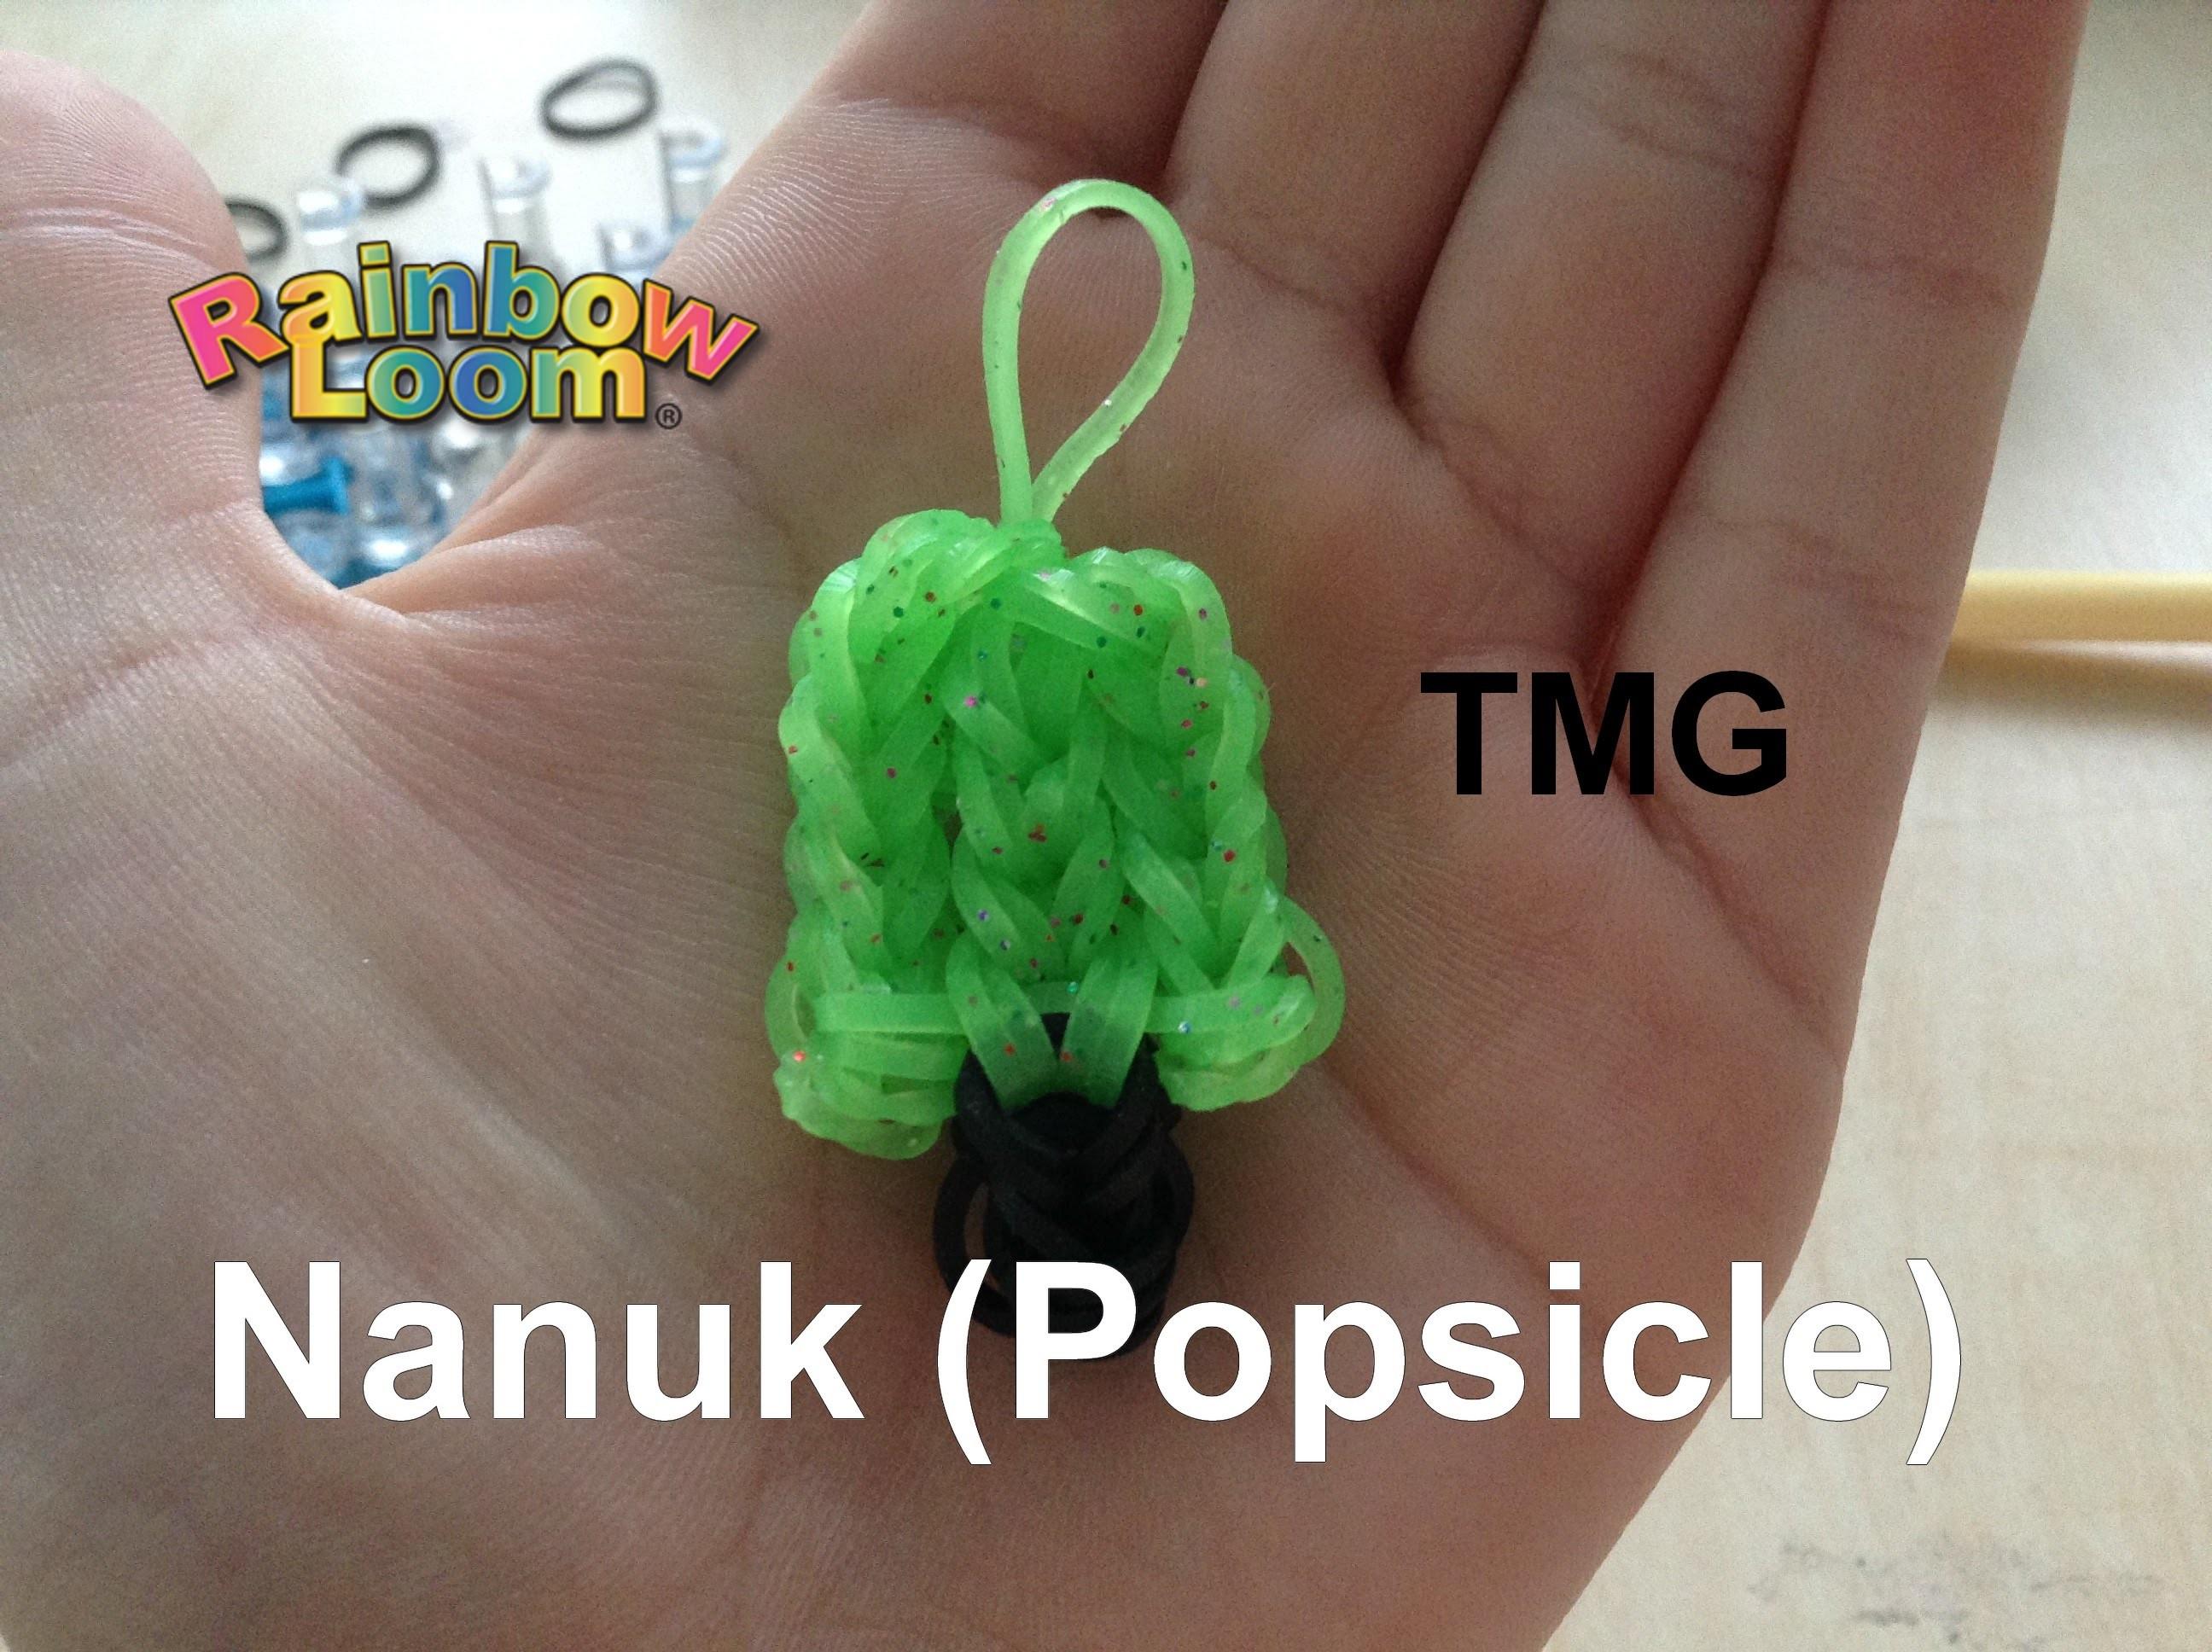 Rainbow Loom - Nanuk (Popsicle) - Ája